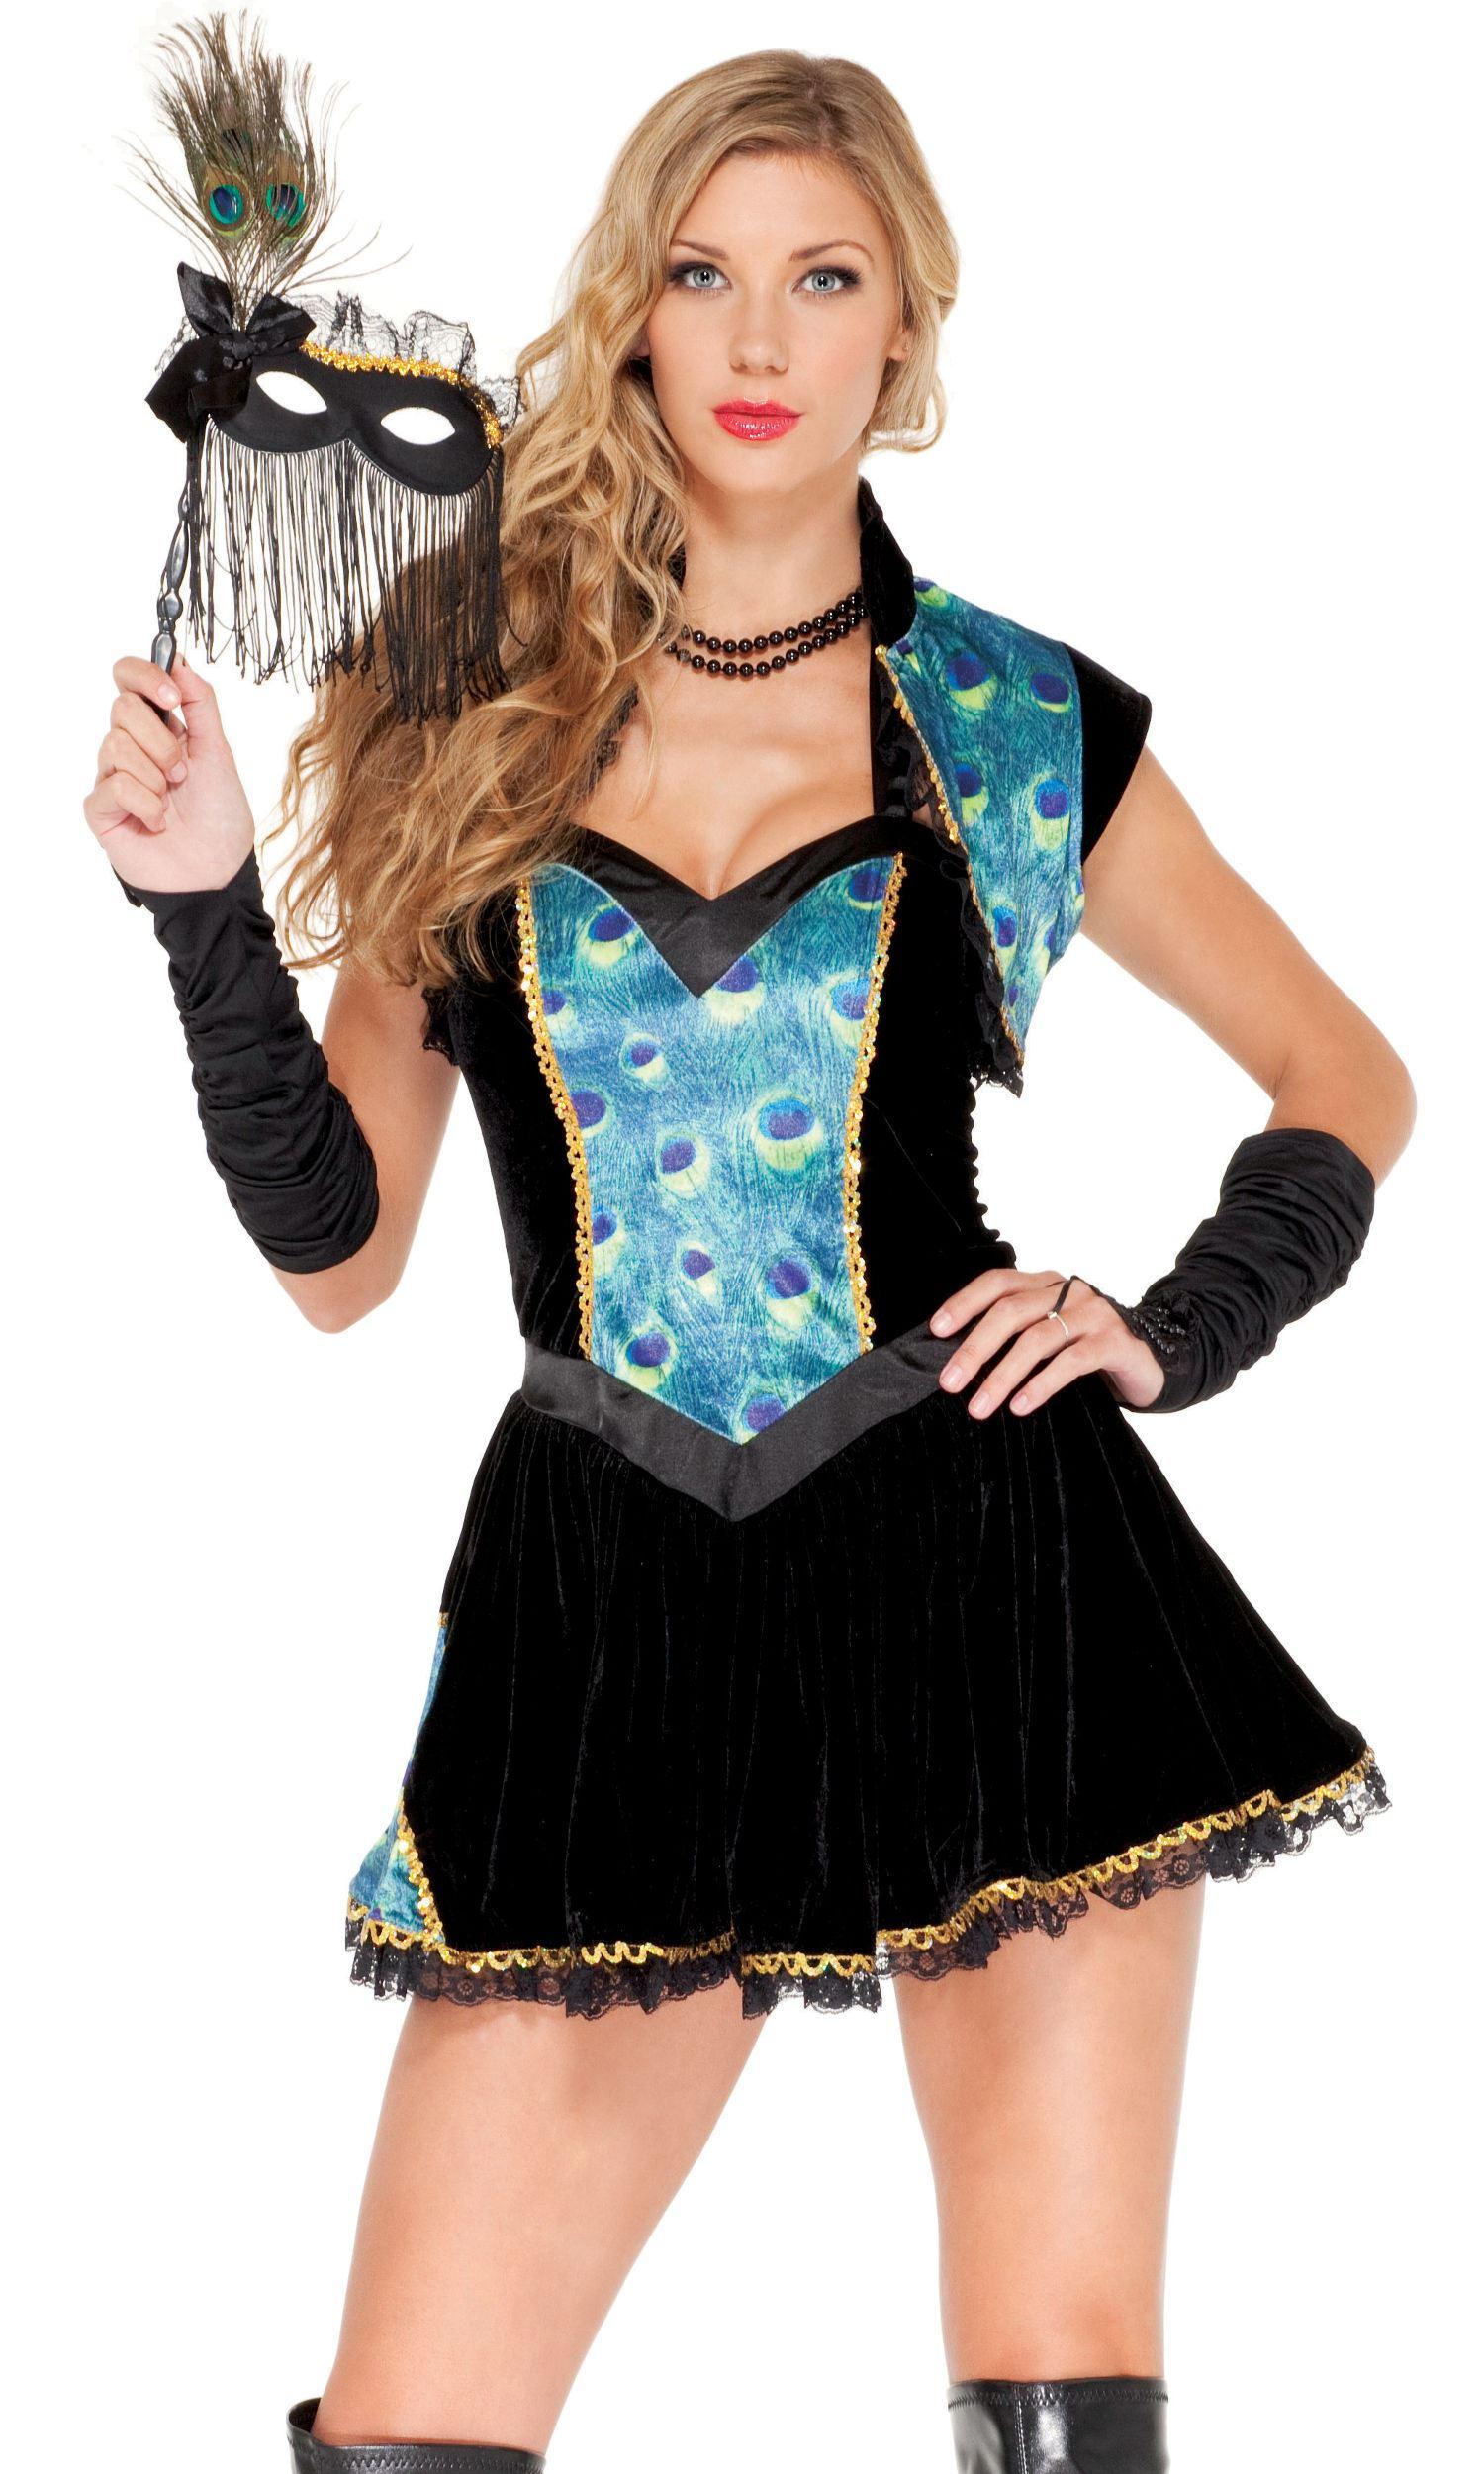 Peacock Masquerade Women Halloween Costume   $79.99   The Costume Land